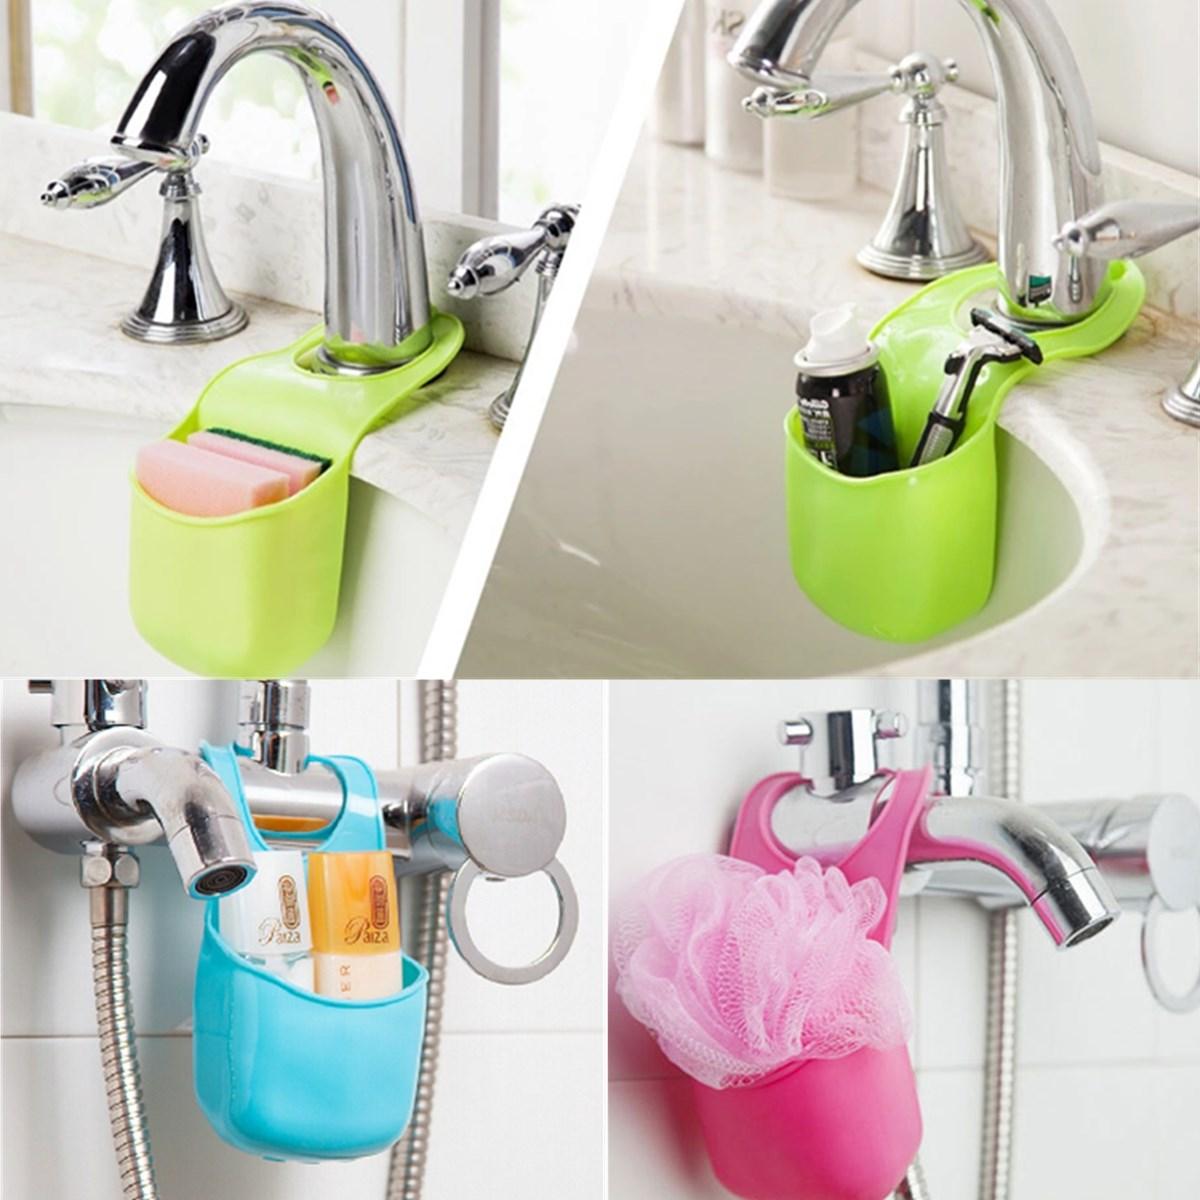 Hanging Bathroom Sink : com : Buy New Novelty Button Design Kitchen Sink Bathroom PVC Hanging ...